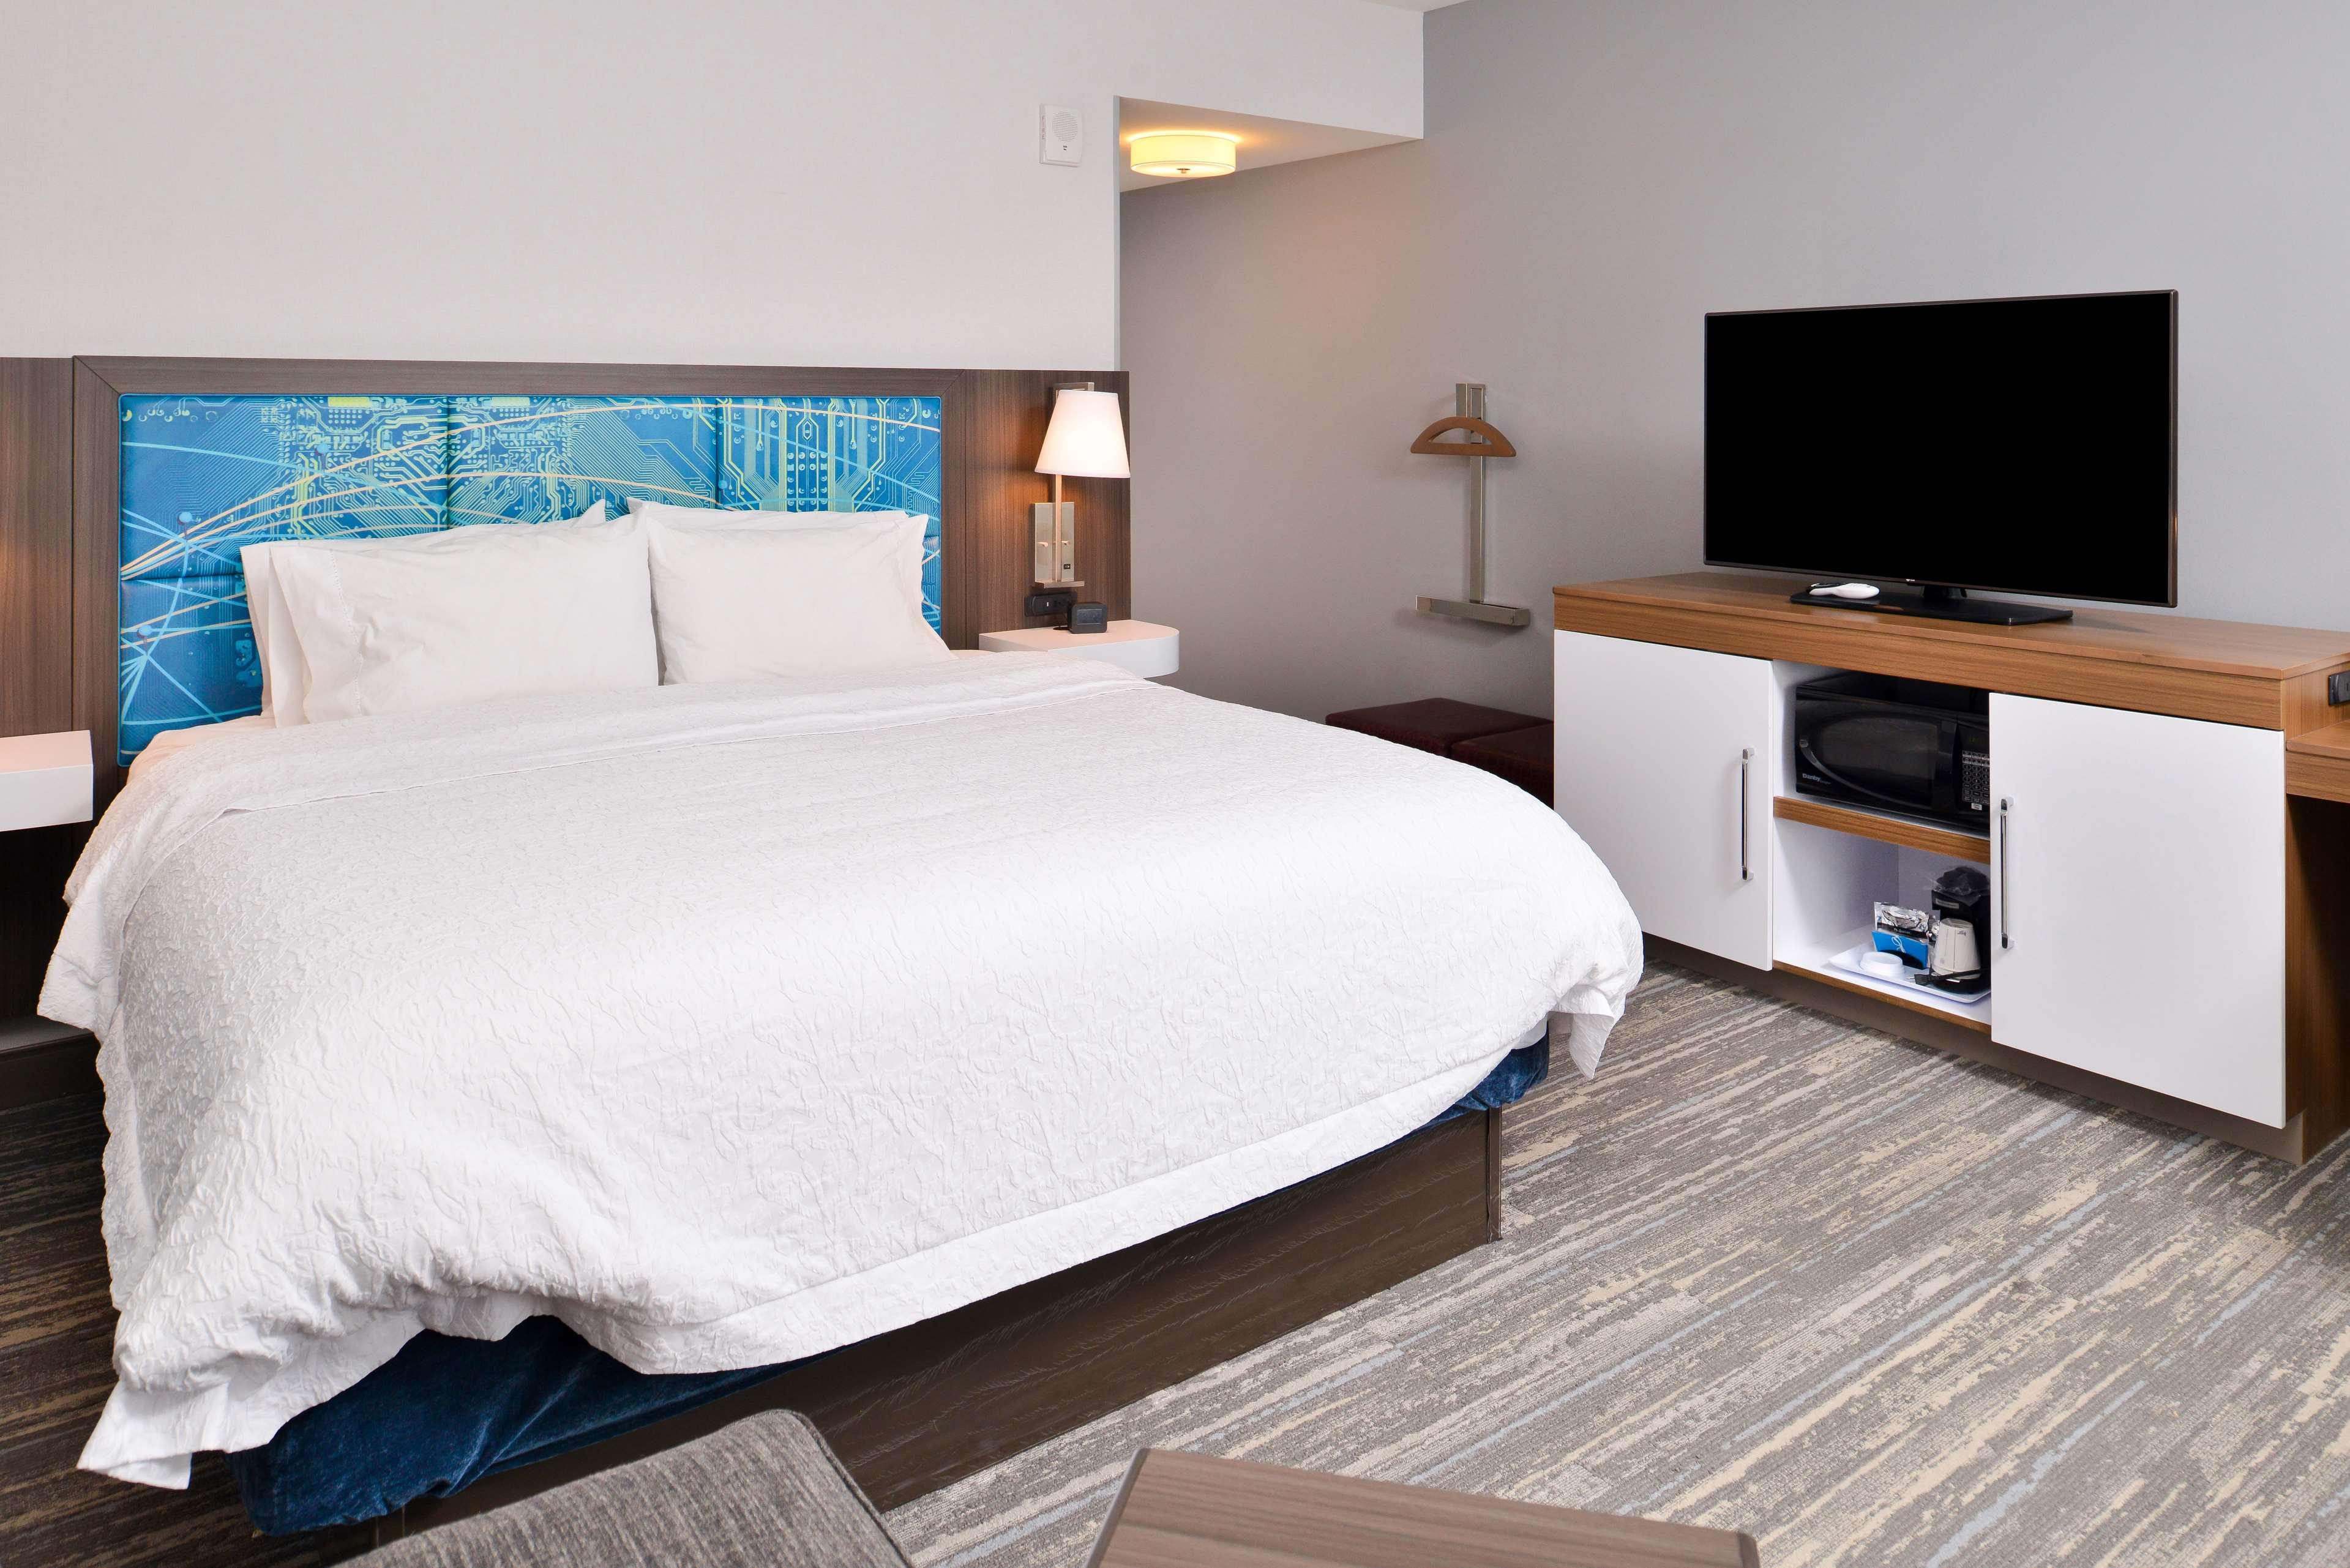 Hampton Inn & Suites St. Paul Oakdale/Woodbury image 32